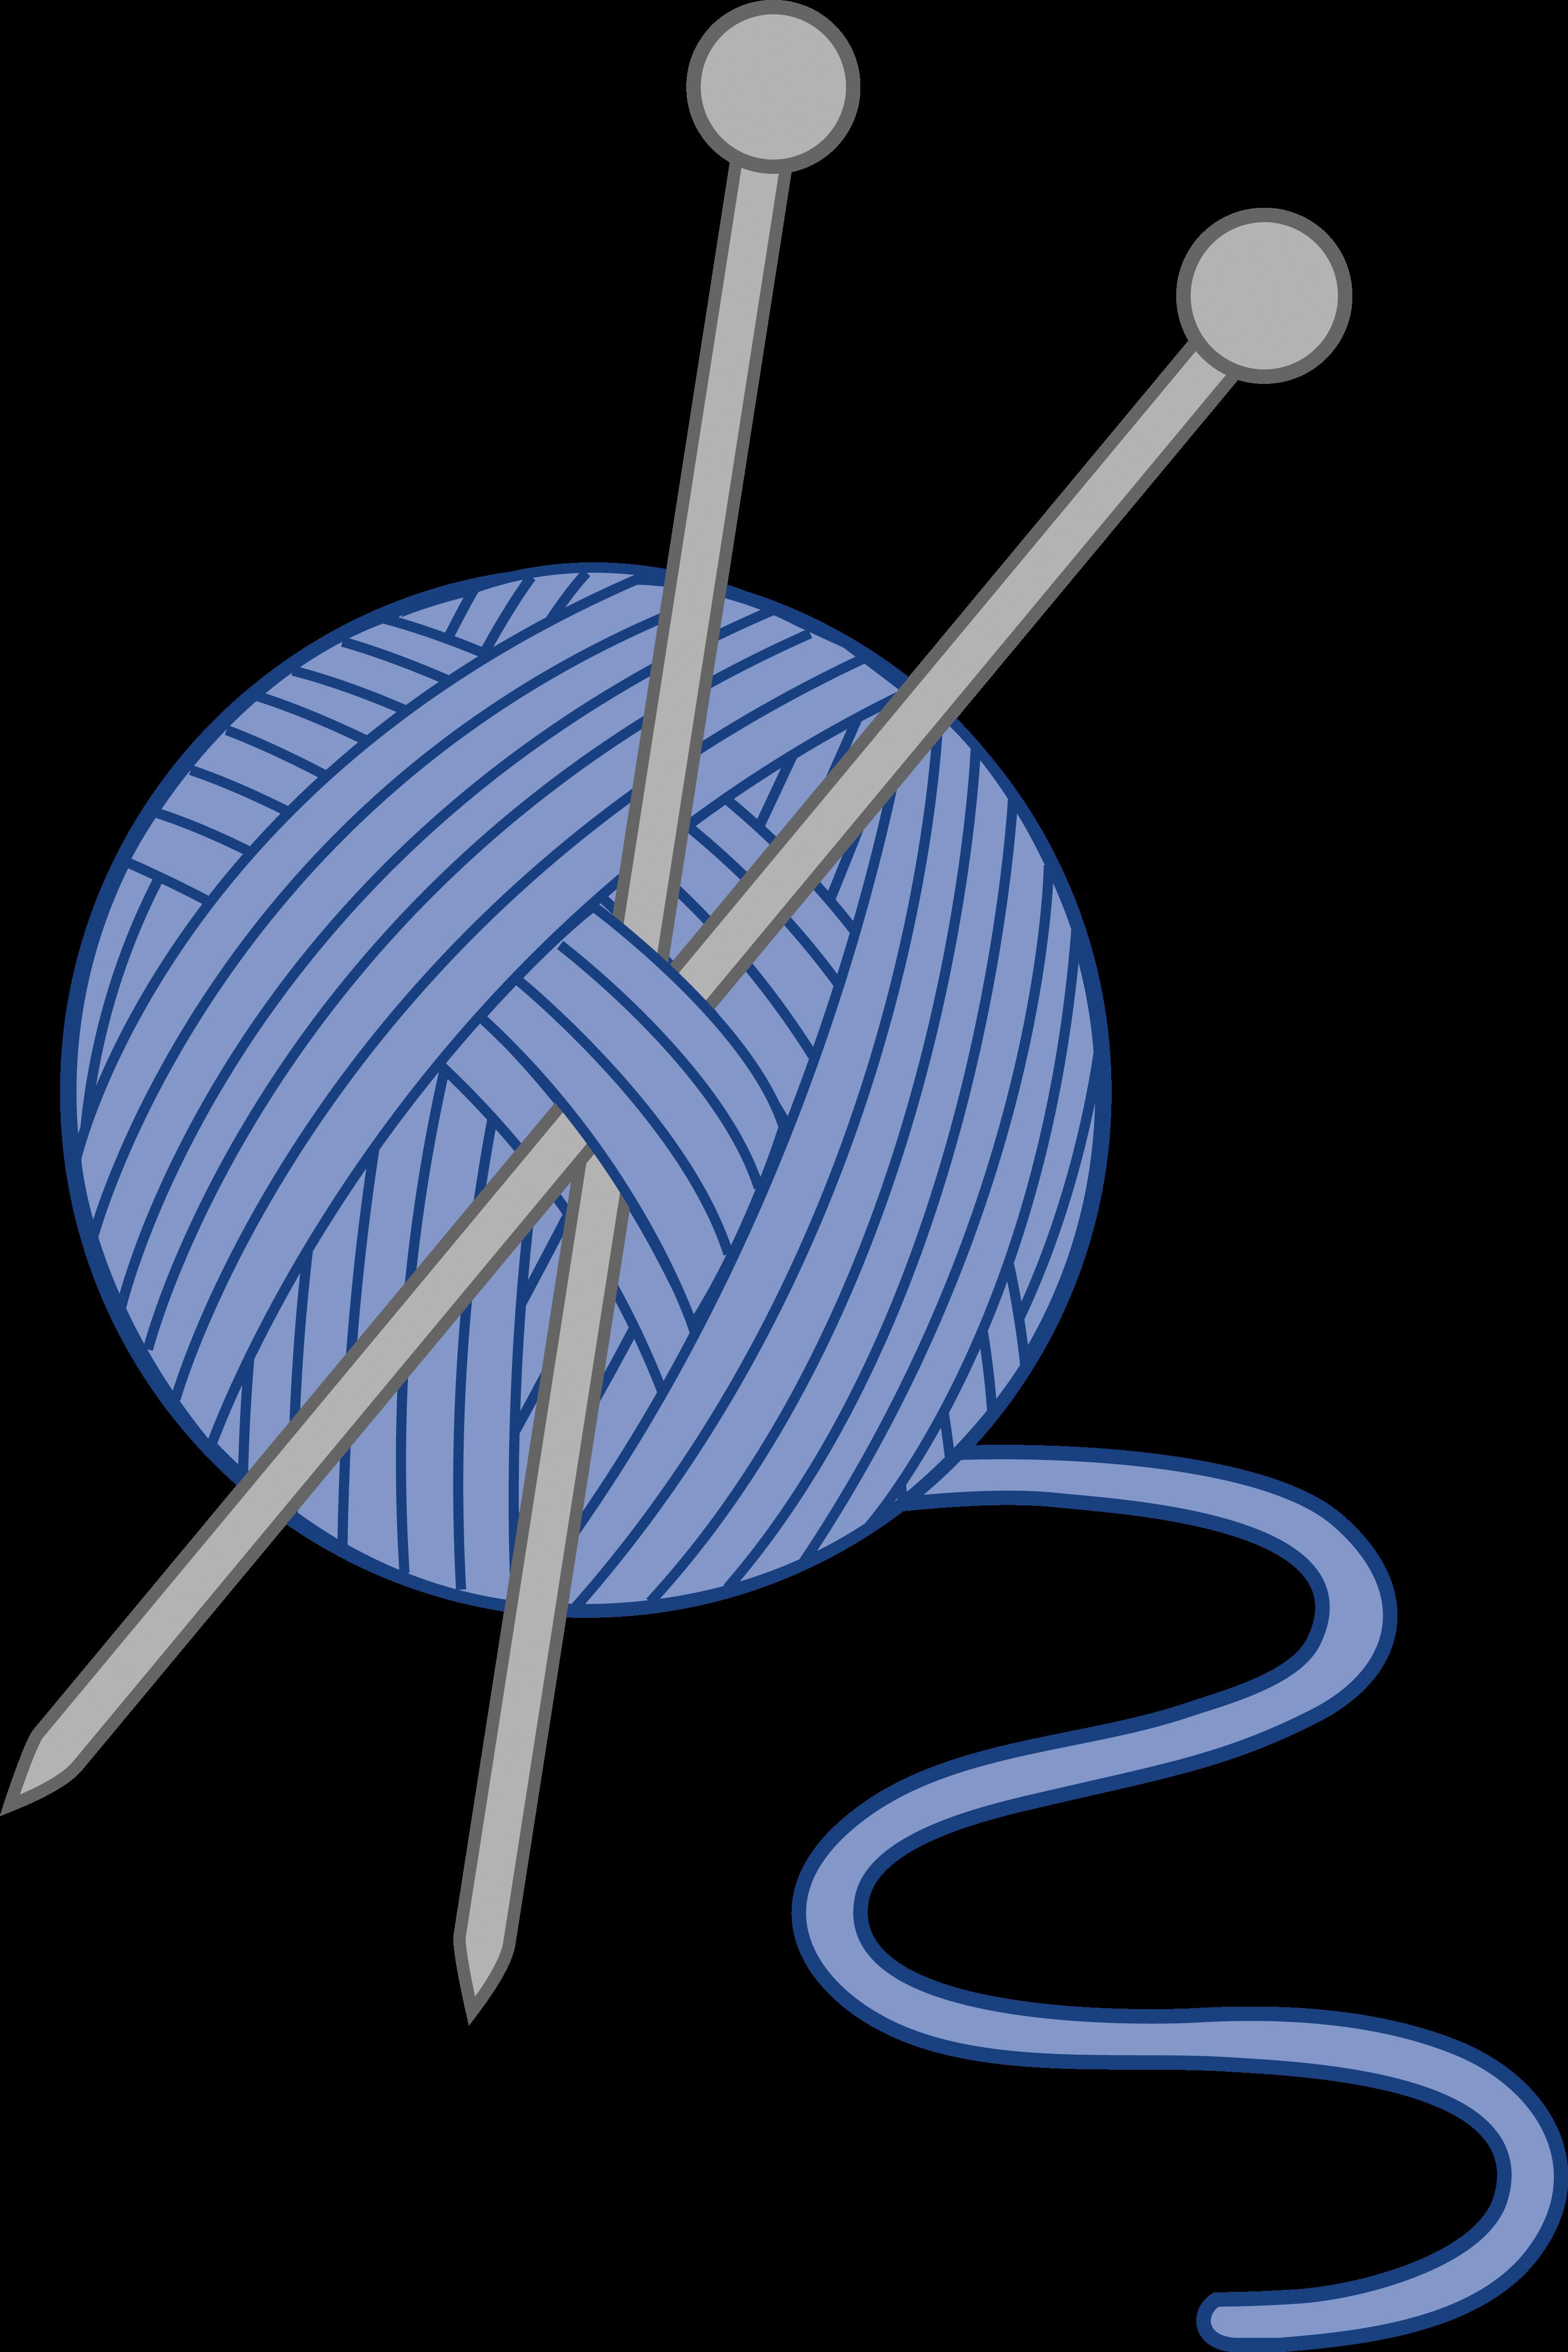 Pin On Knitting Just Wool